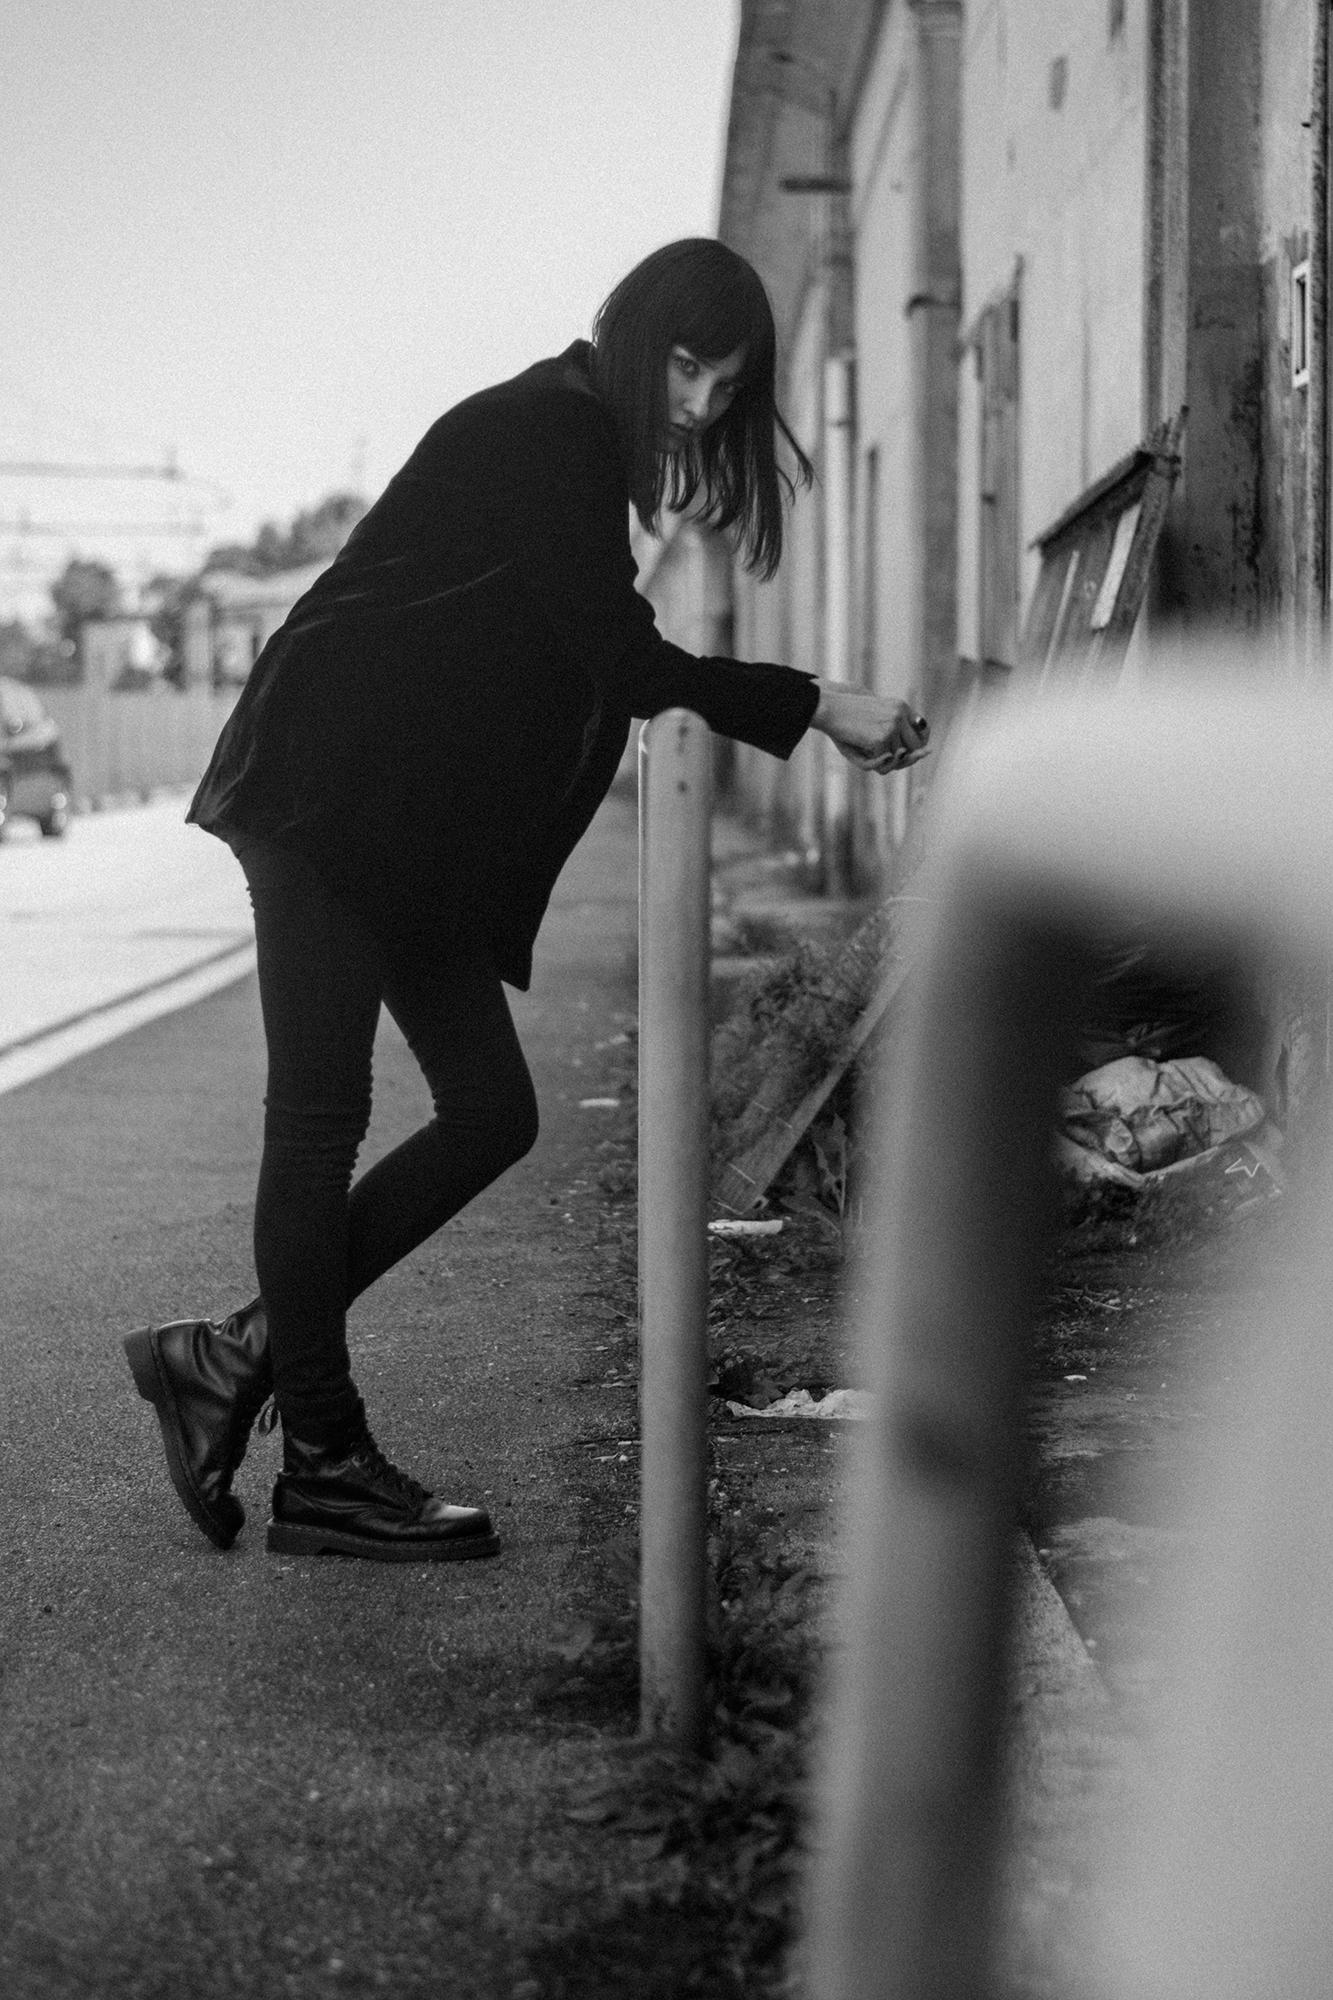 Mila-Nowhere-Andrea-Passon-1